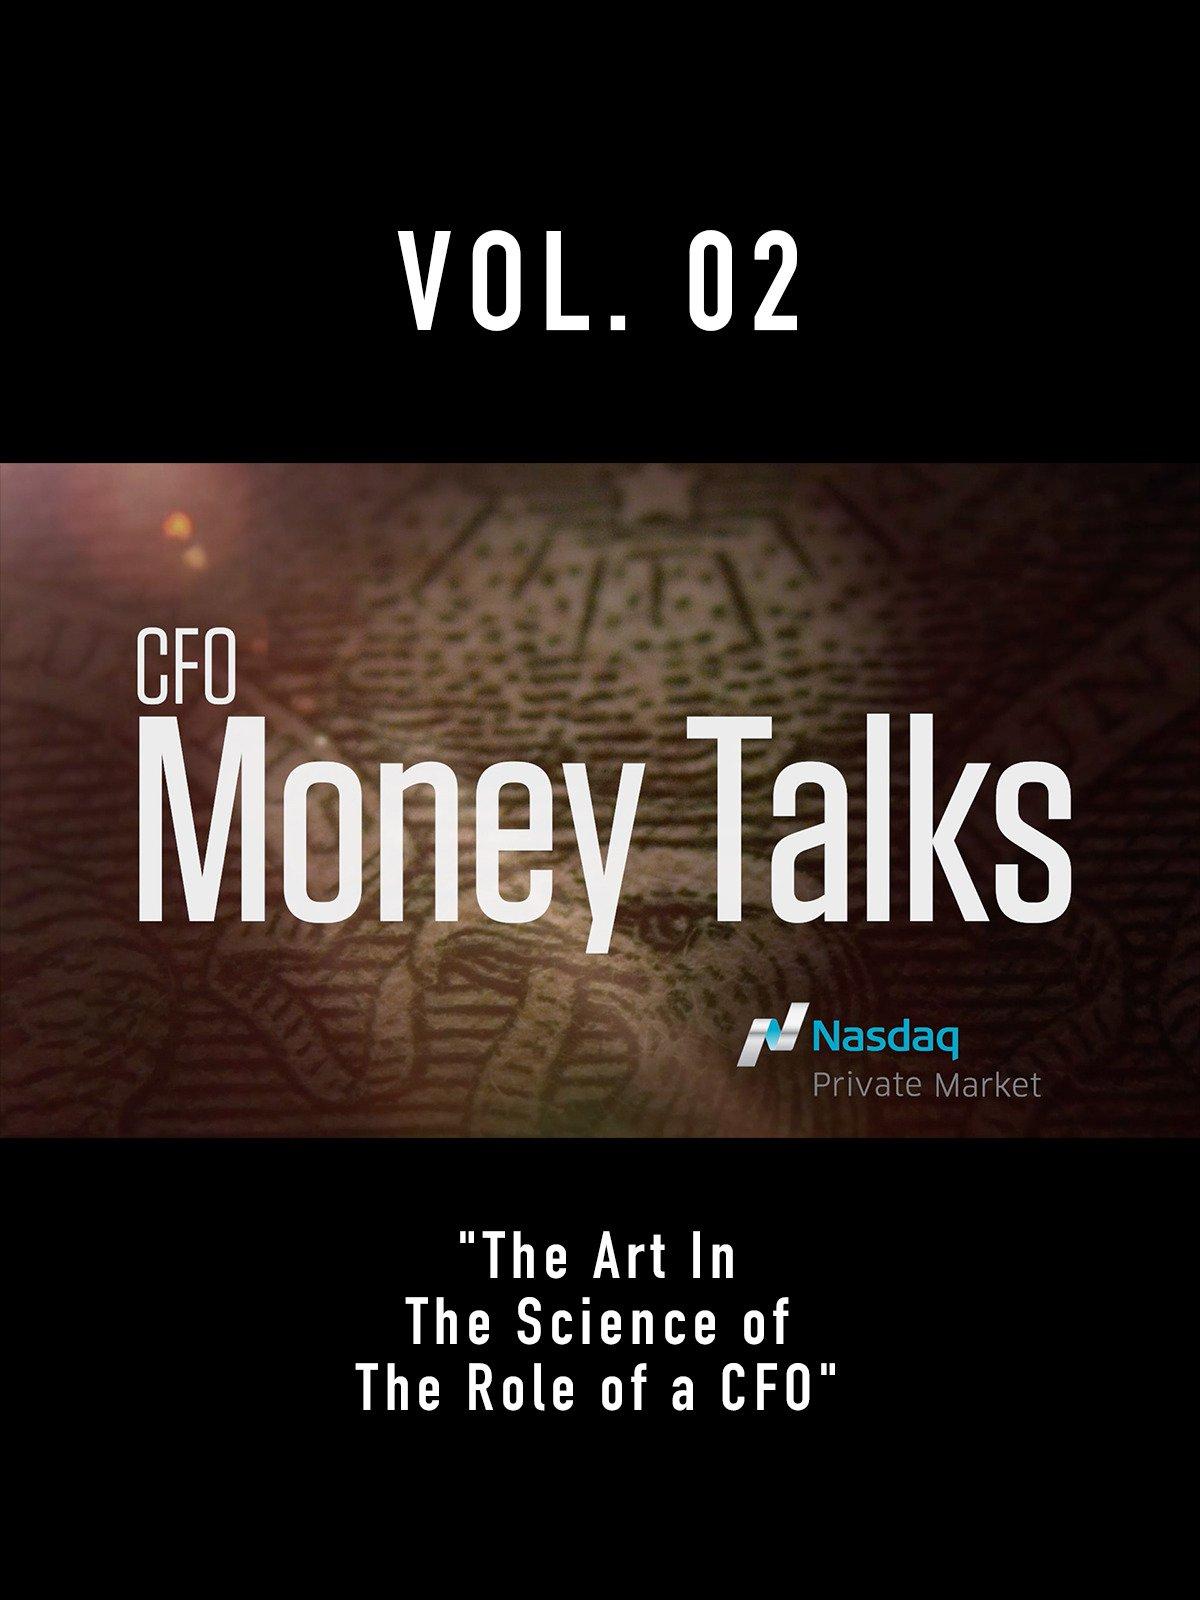 CFO Money Talks Vol. 02